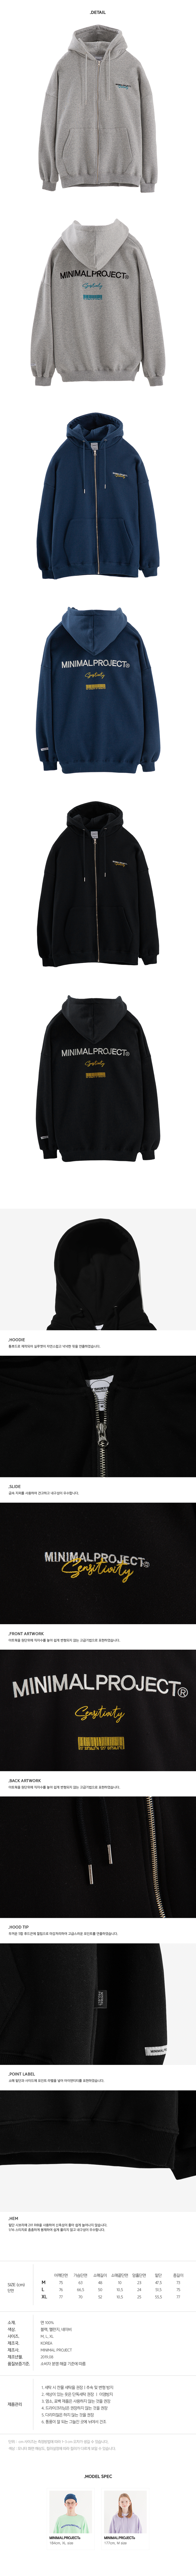 [minimal project] 미니멀프로젝트 바코드 자수 오버핏 후드집업 MZT103 / 3color